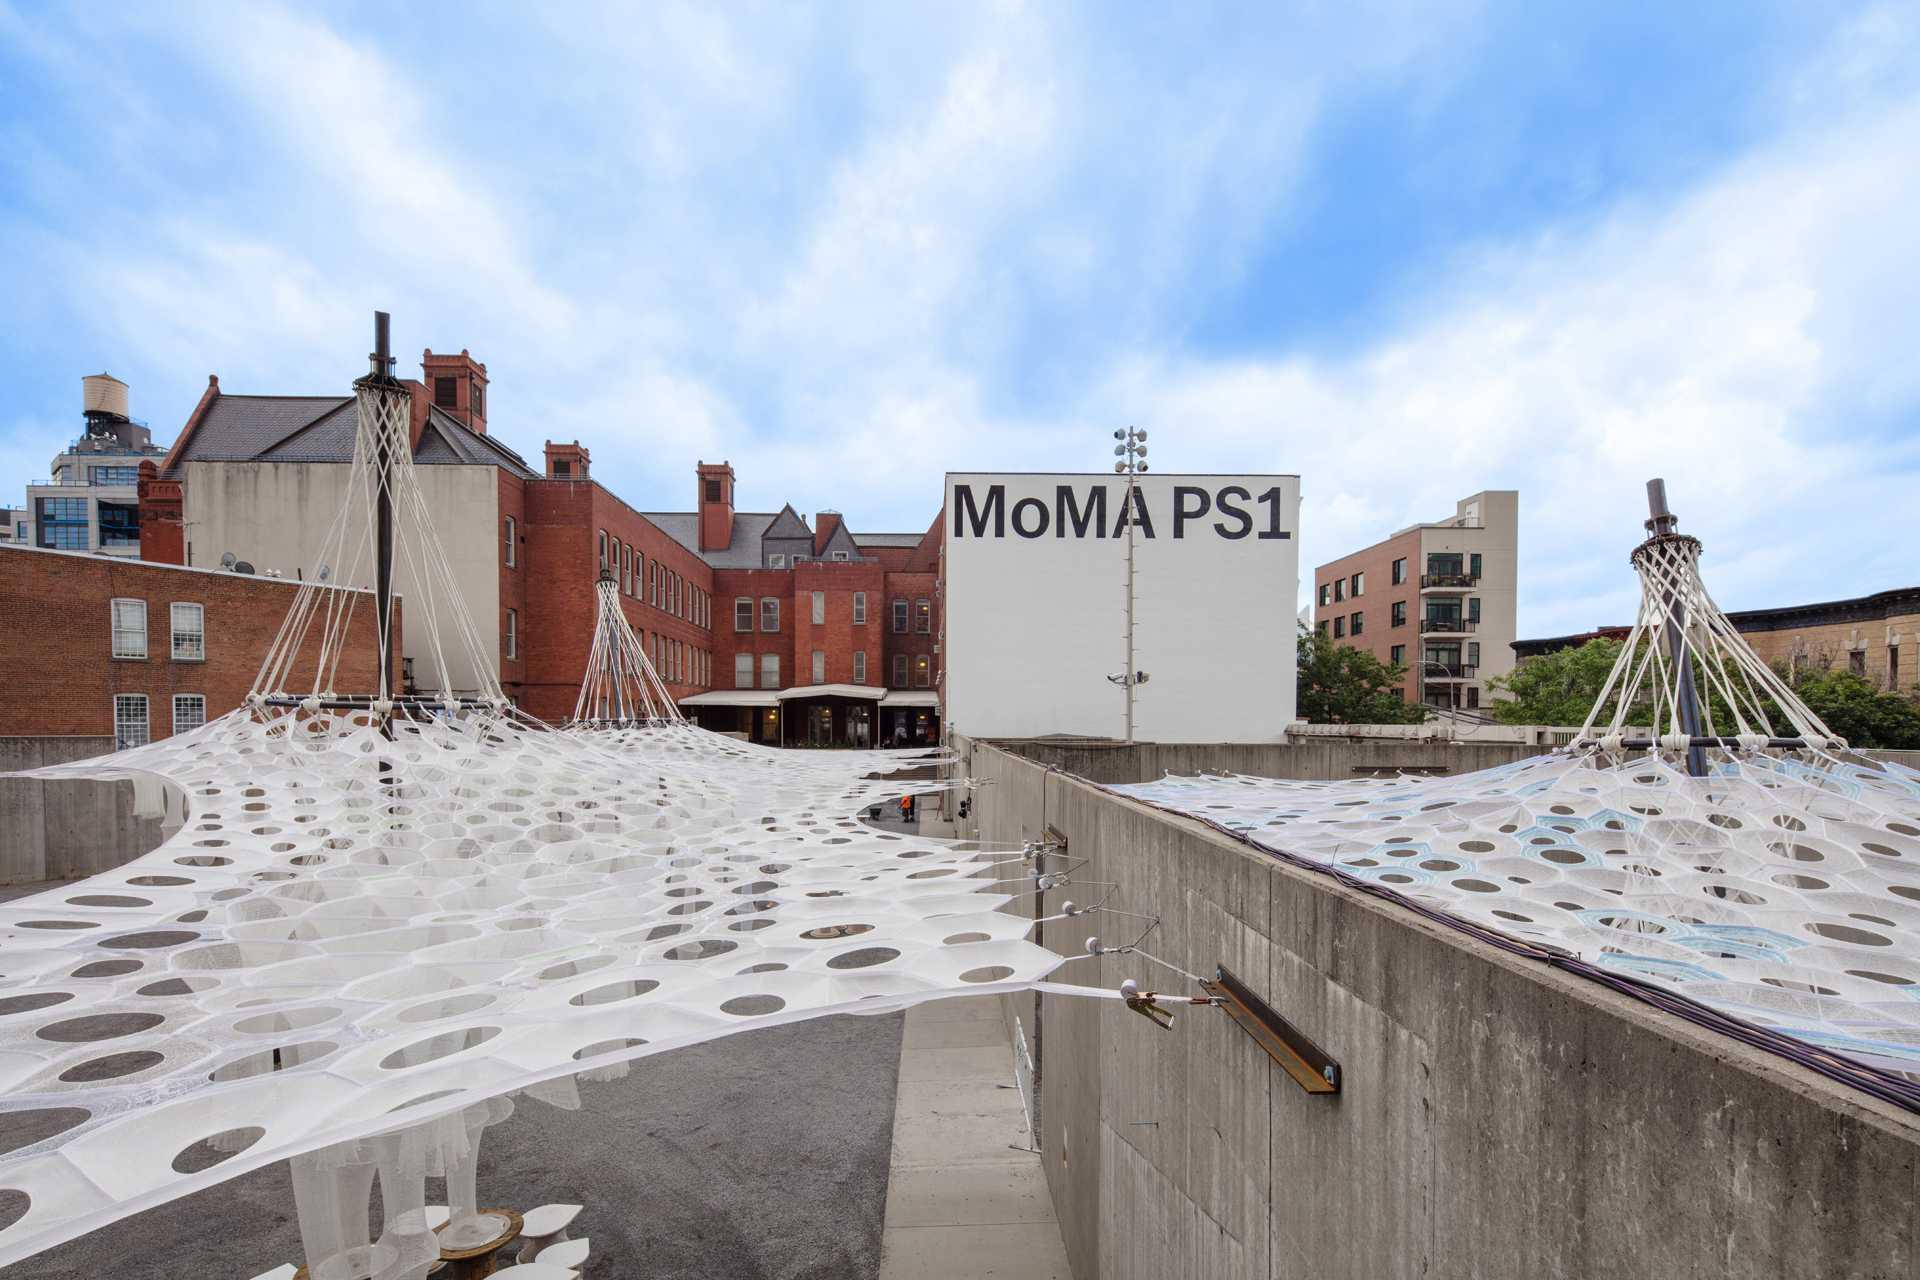 Lumen, MoMA PS1 2017  - 54 02 33